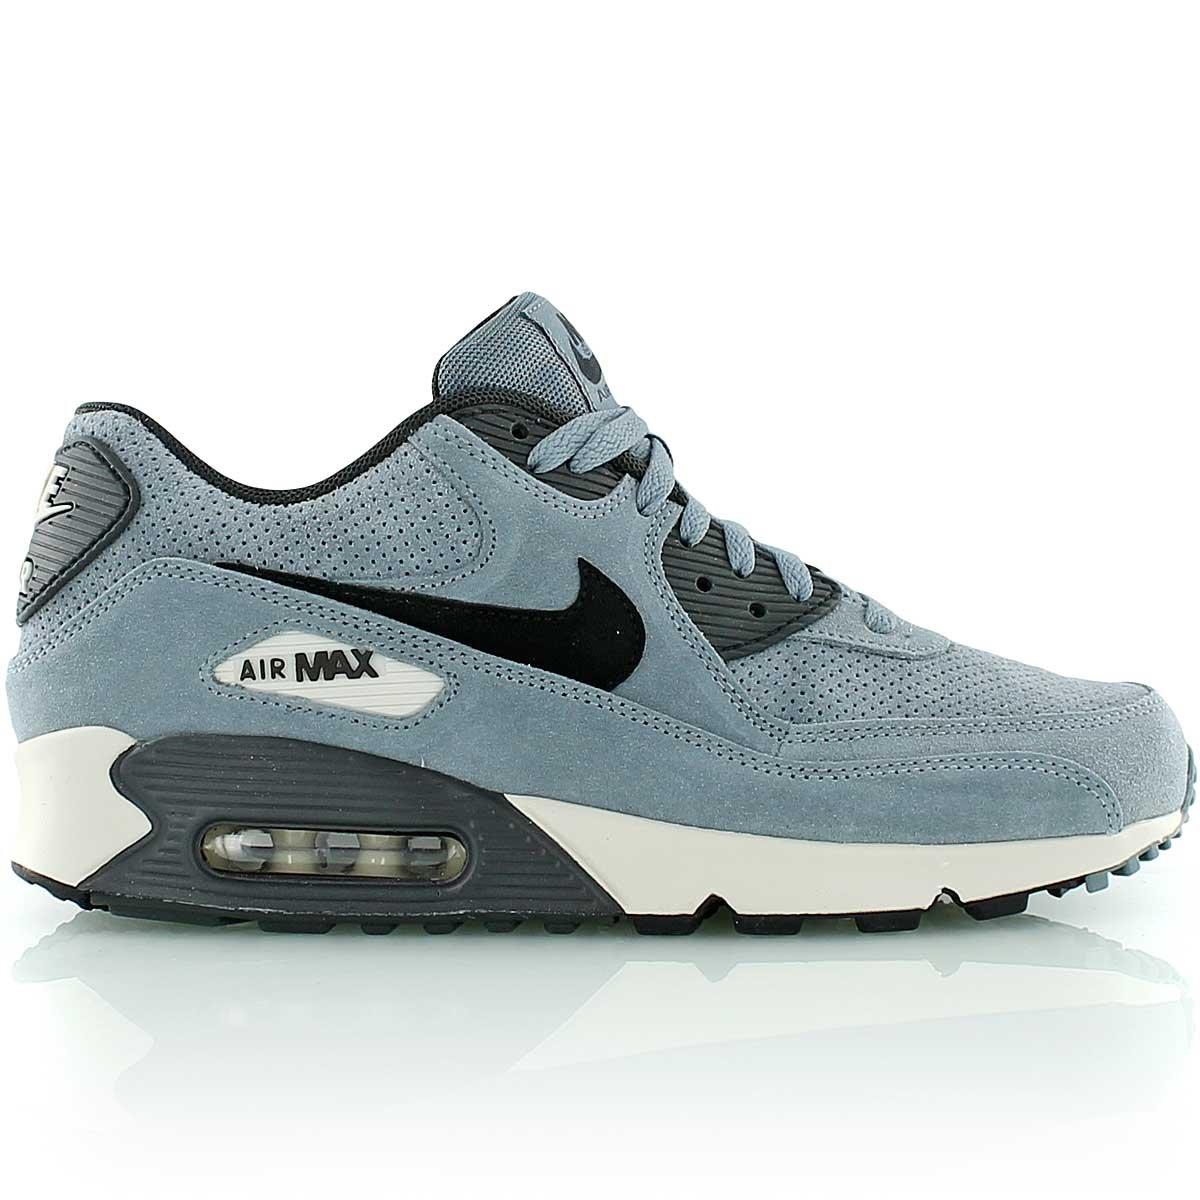 Nike Air Max 90 Leather Premium Suede Mens Trainers Shoes Blue  Graphite Black (UK-13 EUR-48.5 US-14)  Amazon.co.uk  Shoes   Bags 55958adc740d